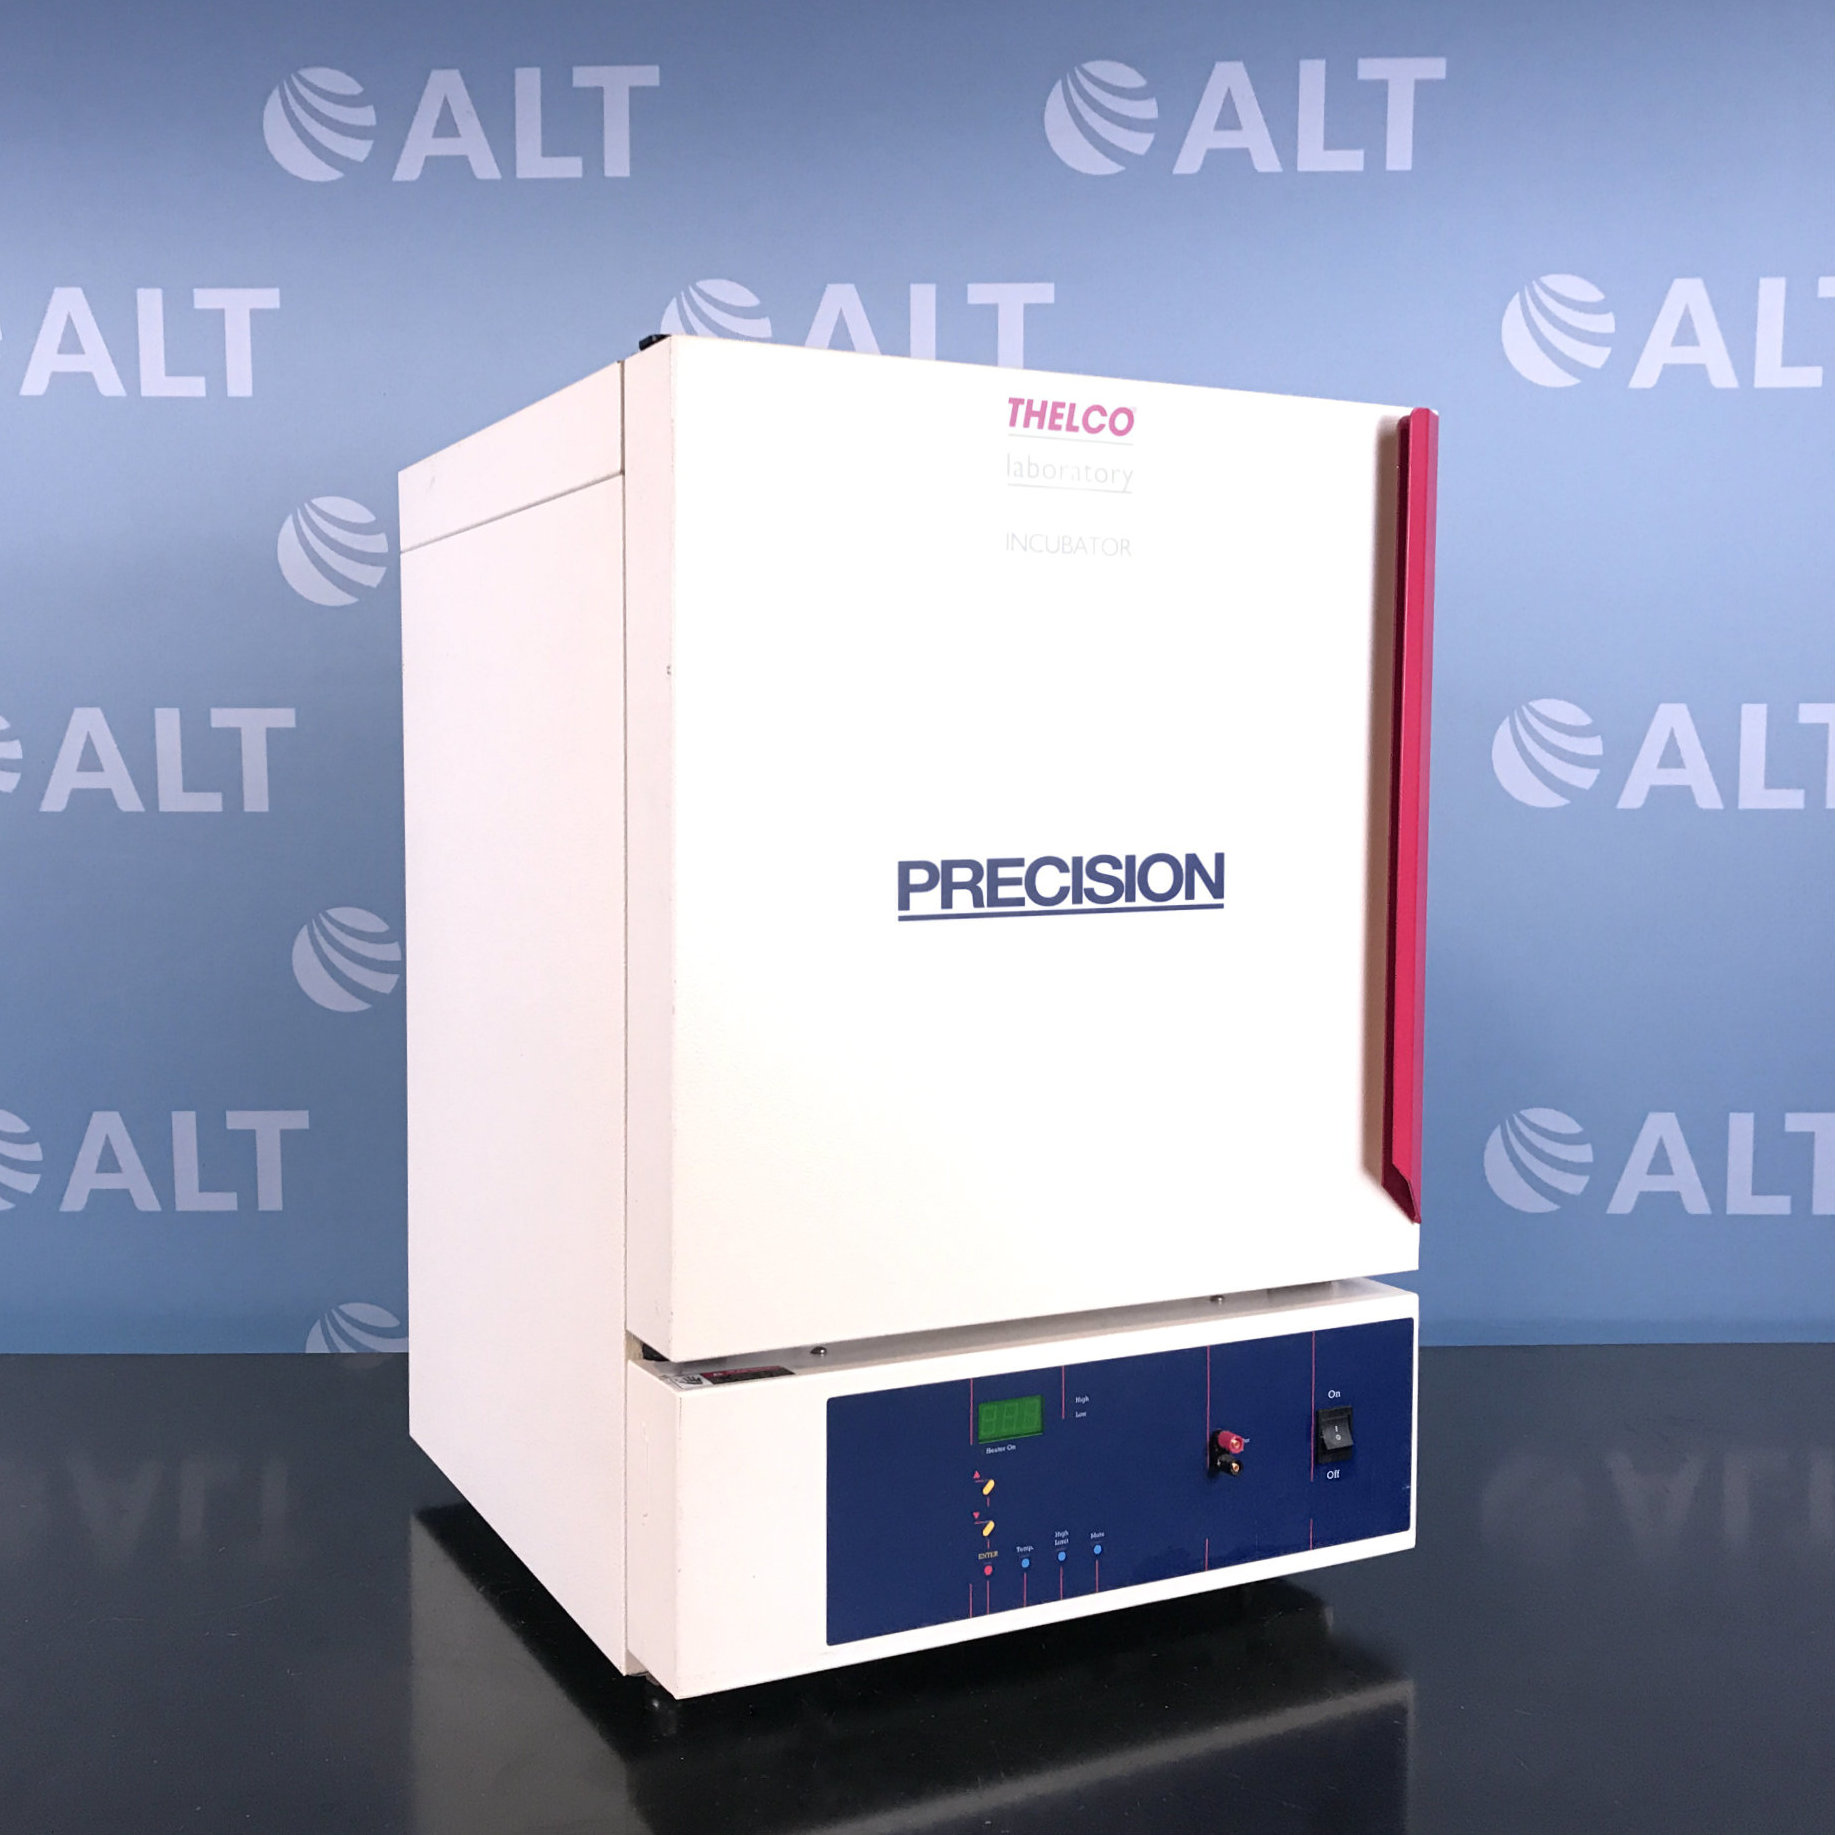 Precision Thelco Incubator 2DG  Image